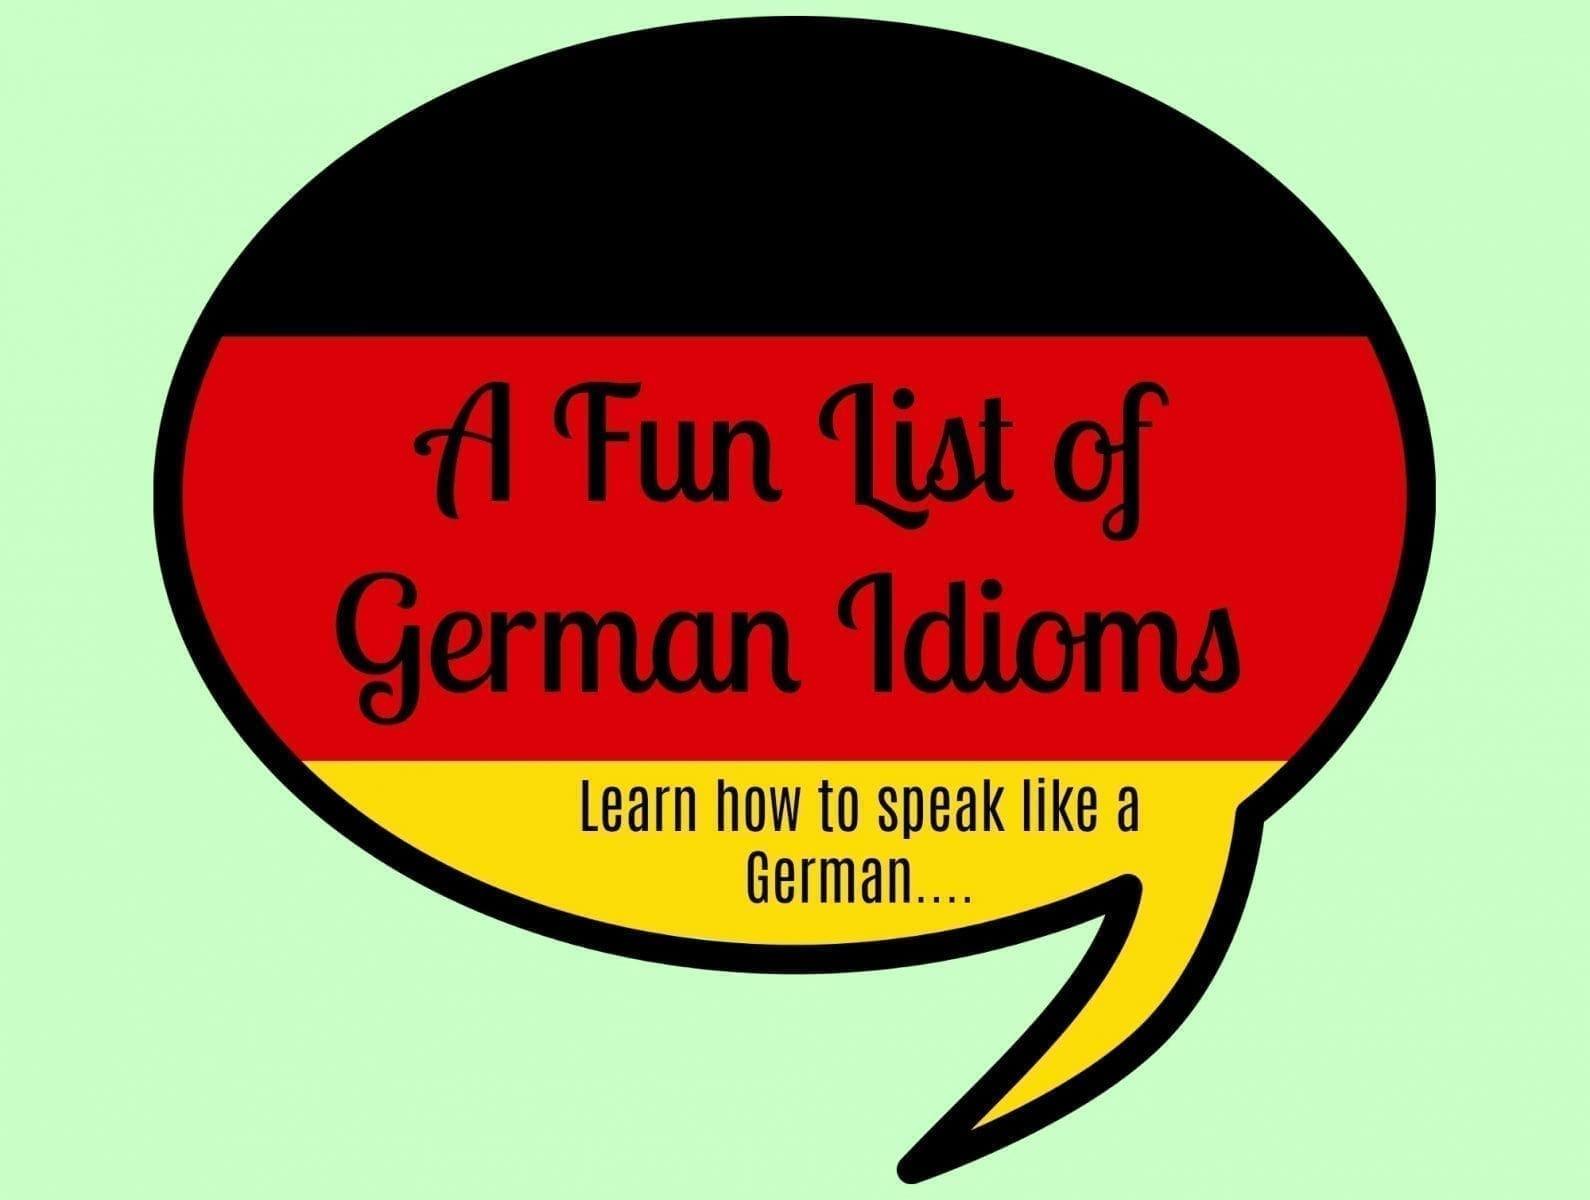 German Idioms List- A Fun Way to learn to Speak Like a German